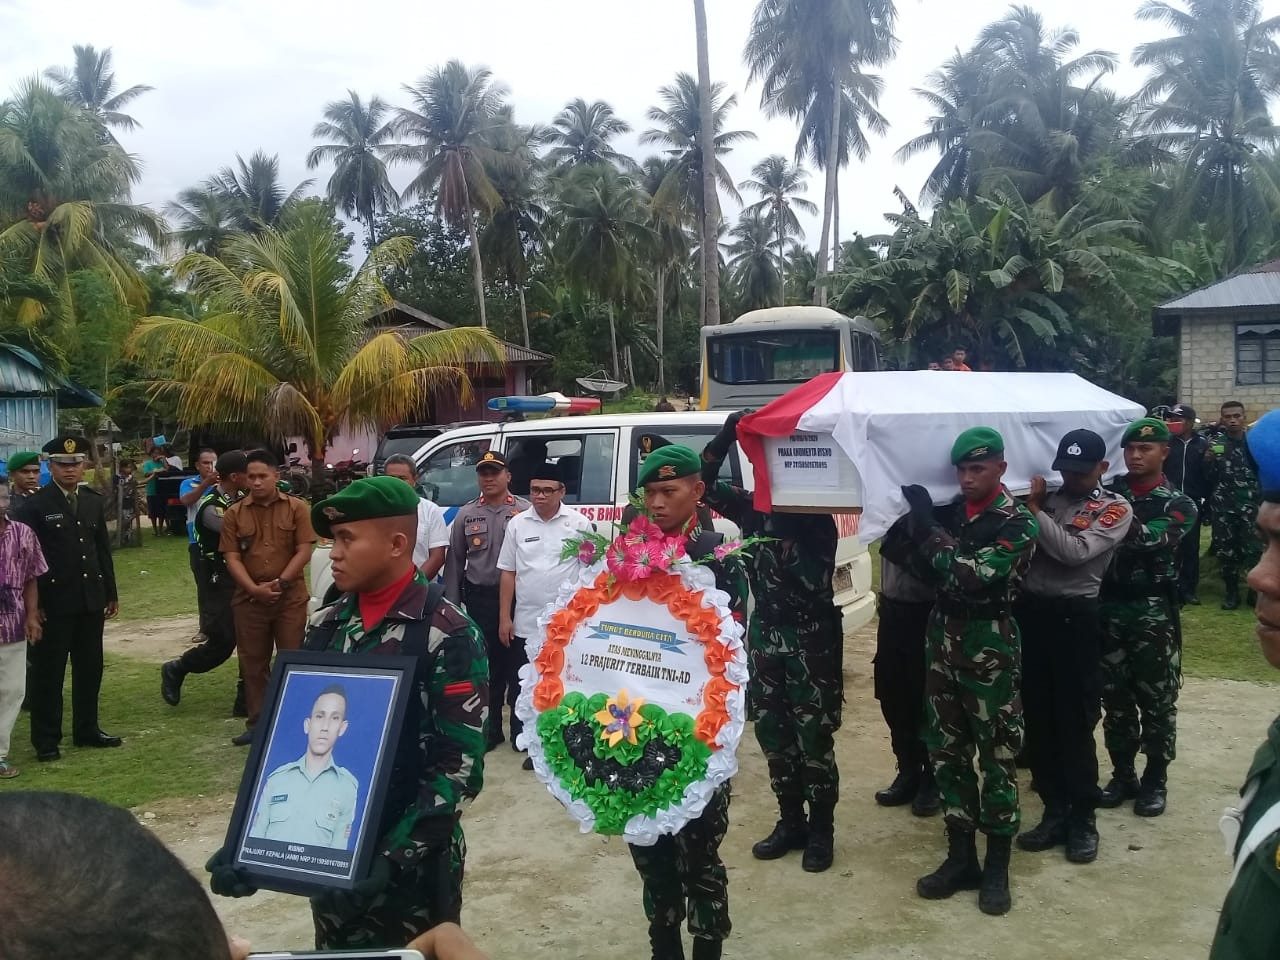 Saat jenazah almarhum Praka Risno tiba di ruma duka di Desa Konde, Rabu 19 Februari 2020. Foto: Ardilan/Mediakendari.com